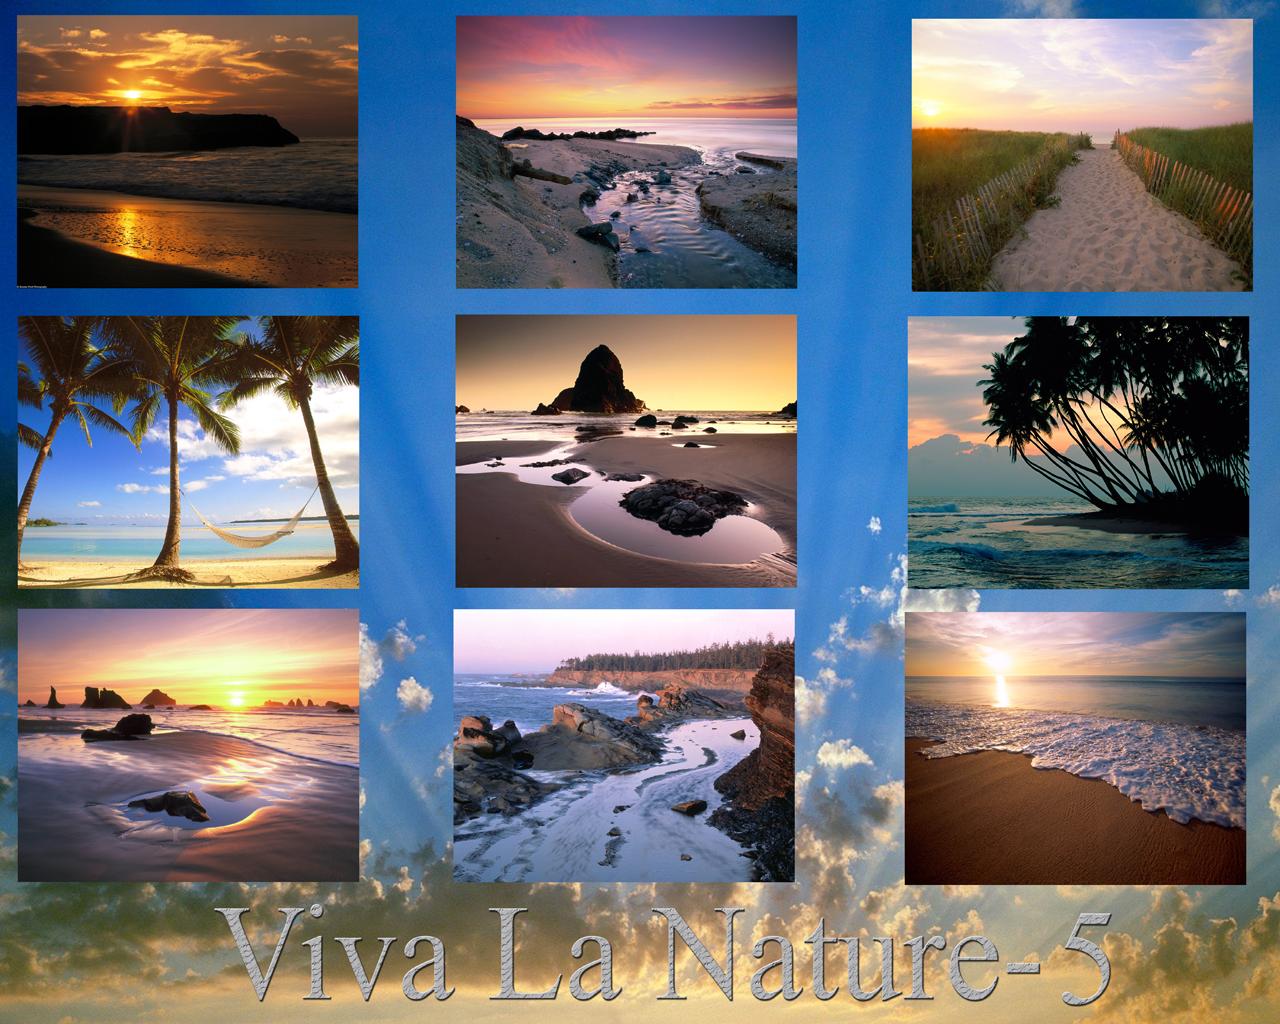 Viva La Nature Wallpaper Pack5 by GeekGod4